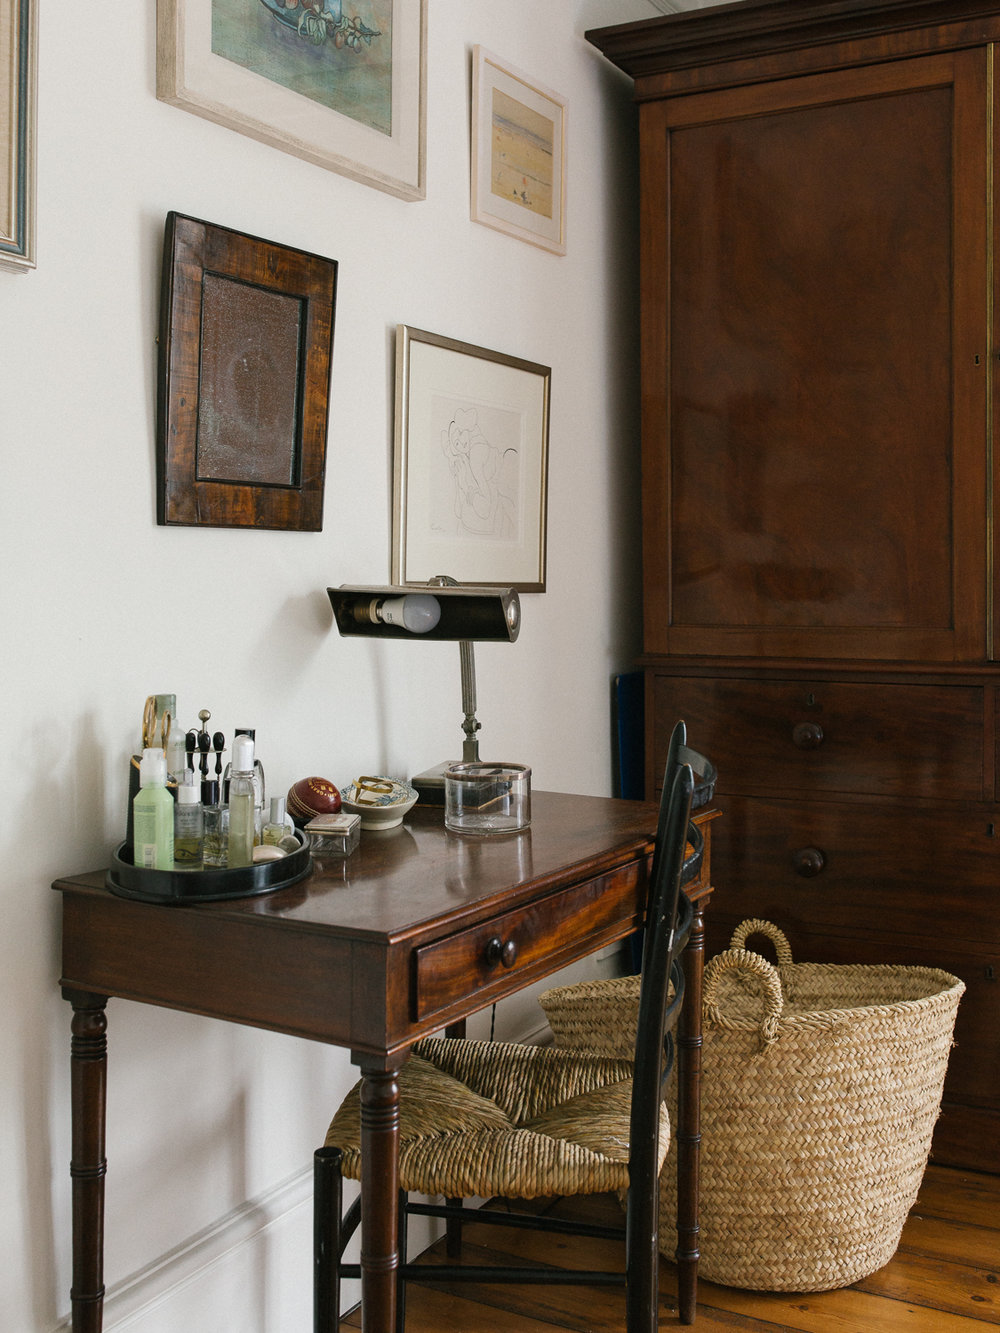 vanity corner | Larkhall Place, Bath